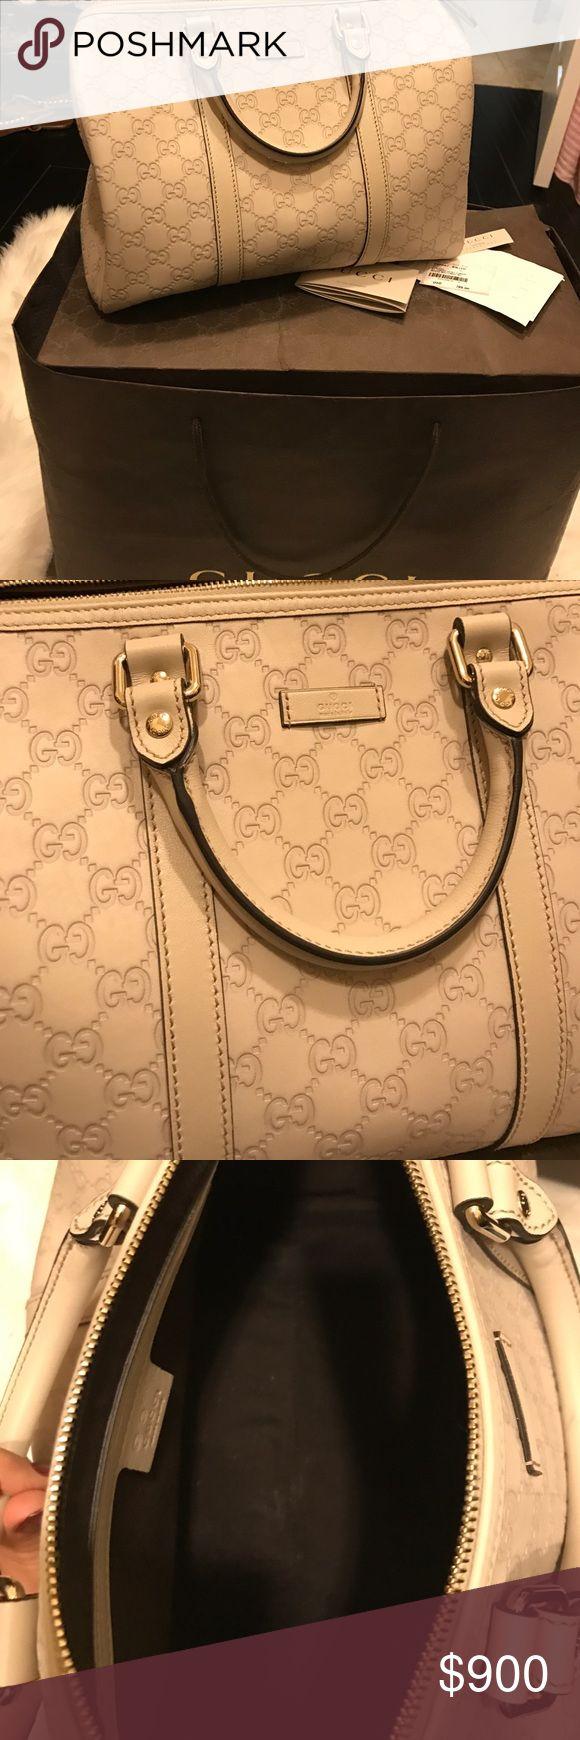 Gucci purse Beautiful Gucci purse perfect size! Gucci Bags Satchels